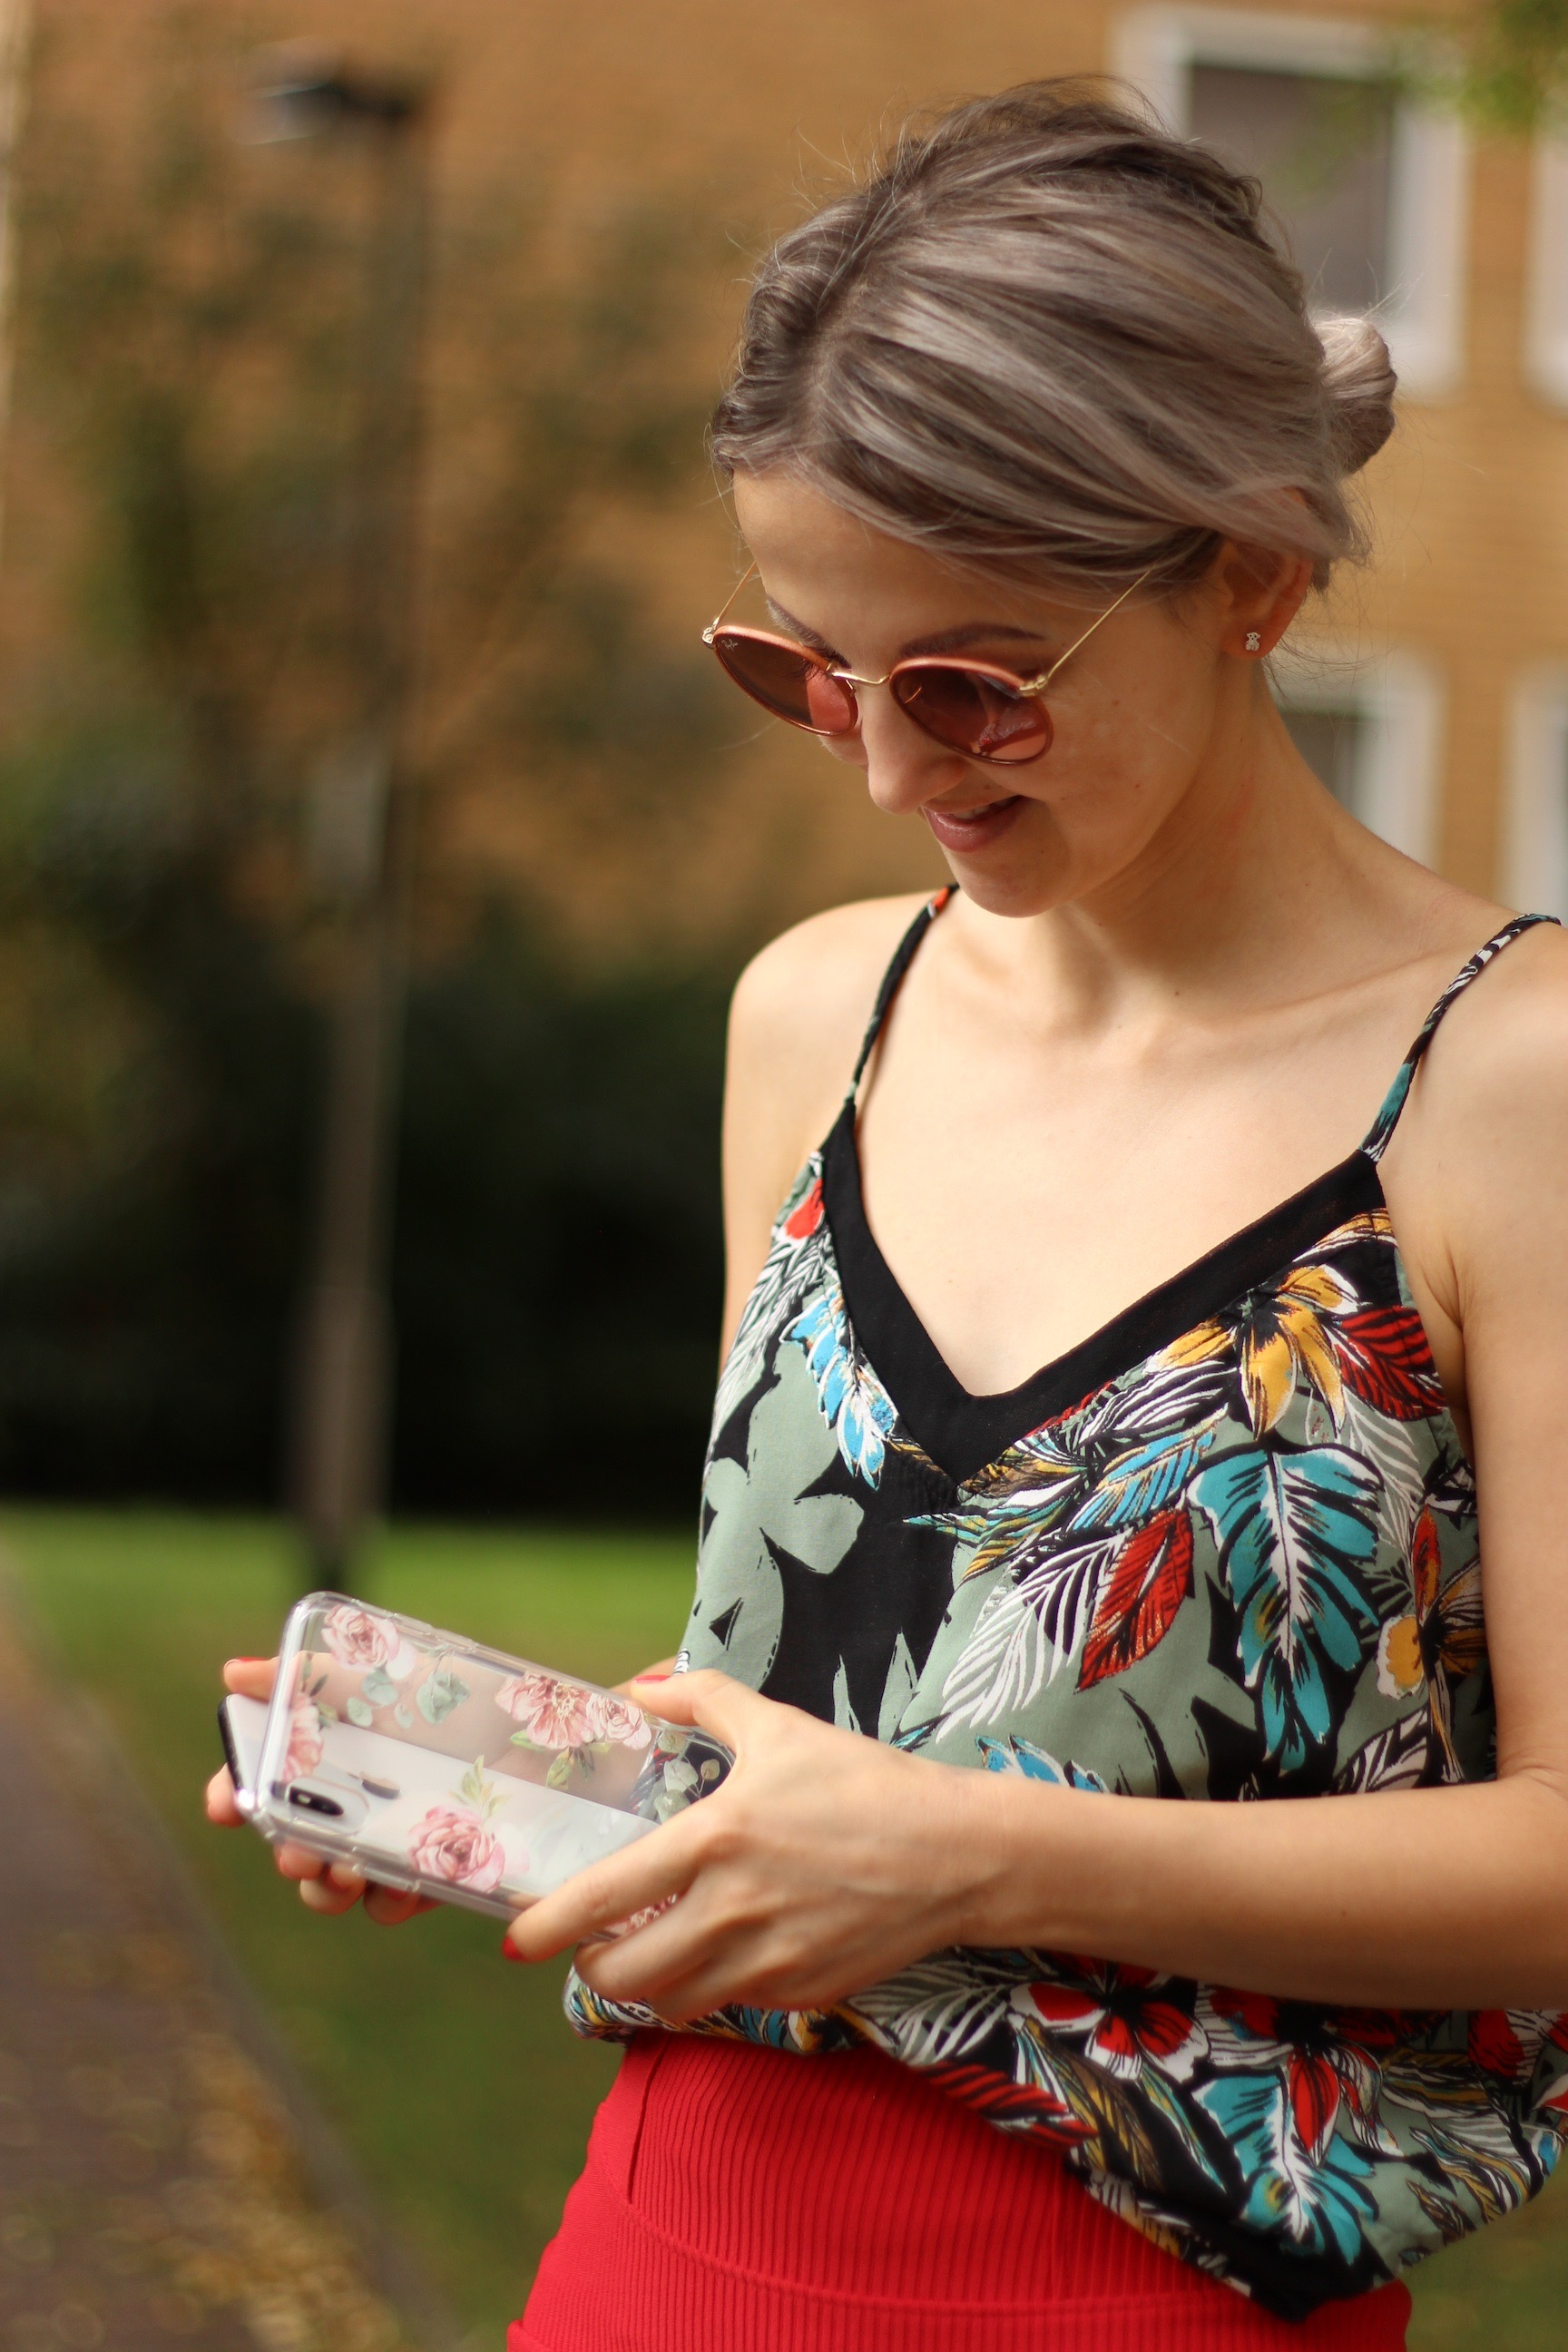 Modeblogger aus Hannover, Gadgets